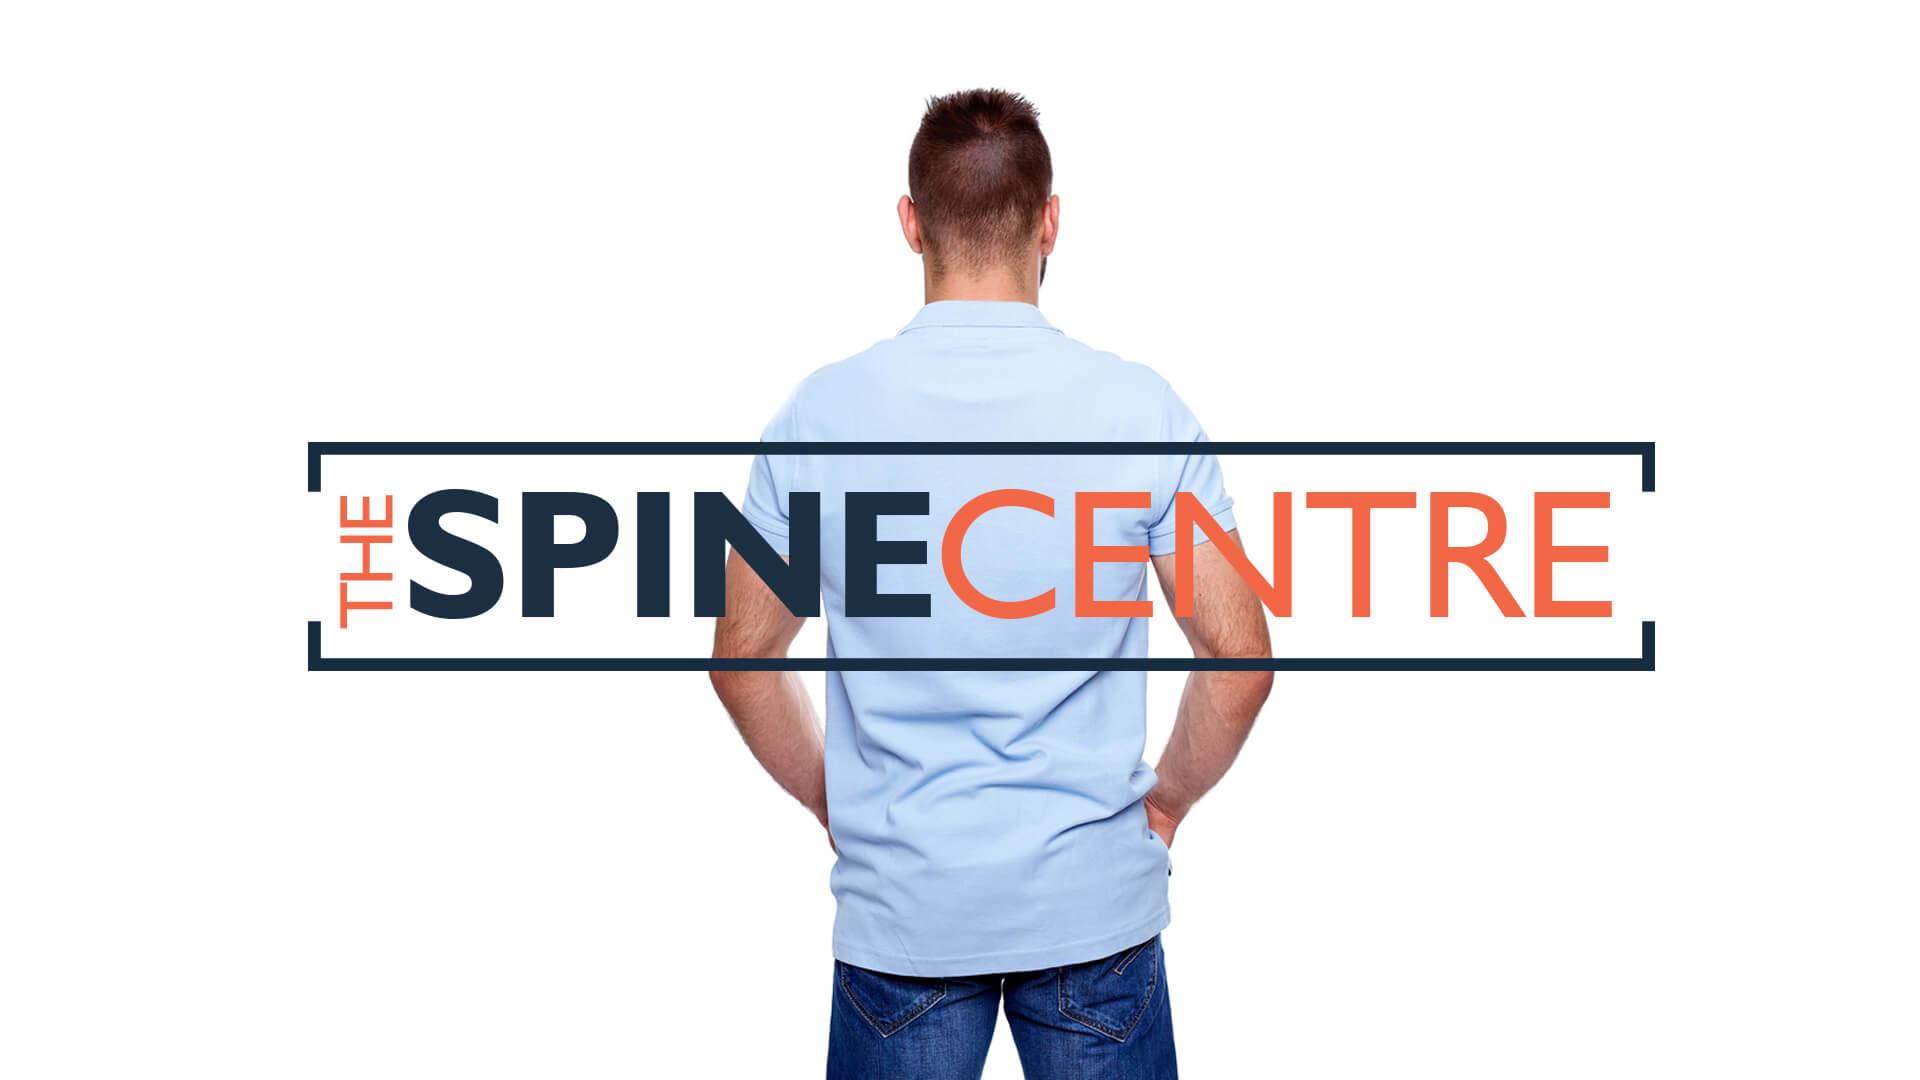 Spine Centre Chiropractic Slider Image 2